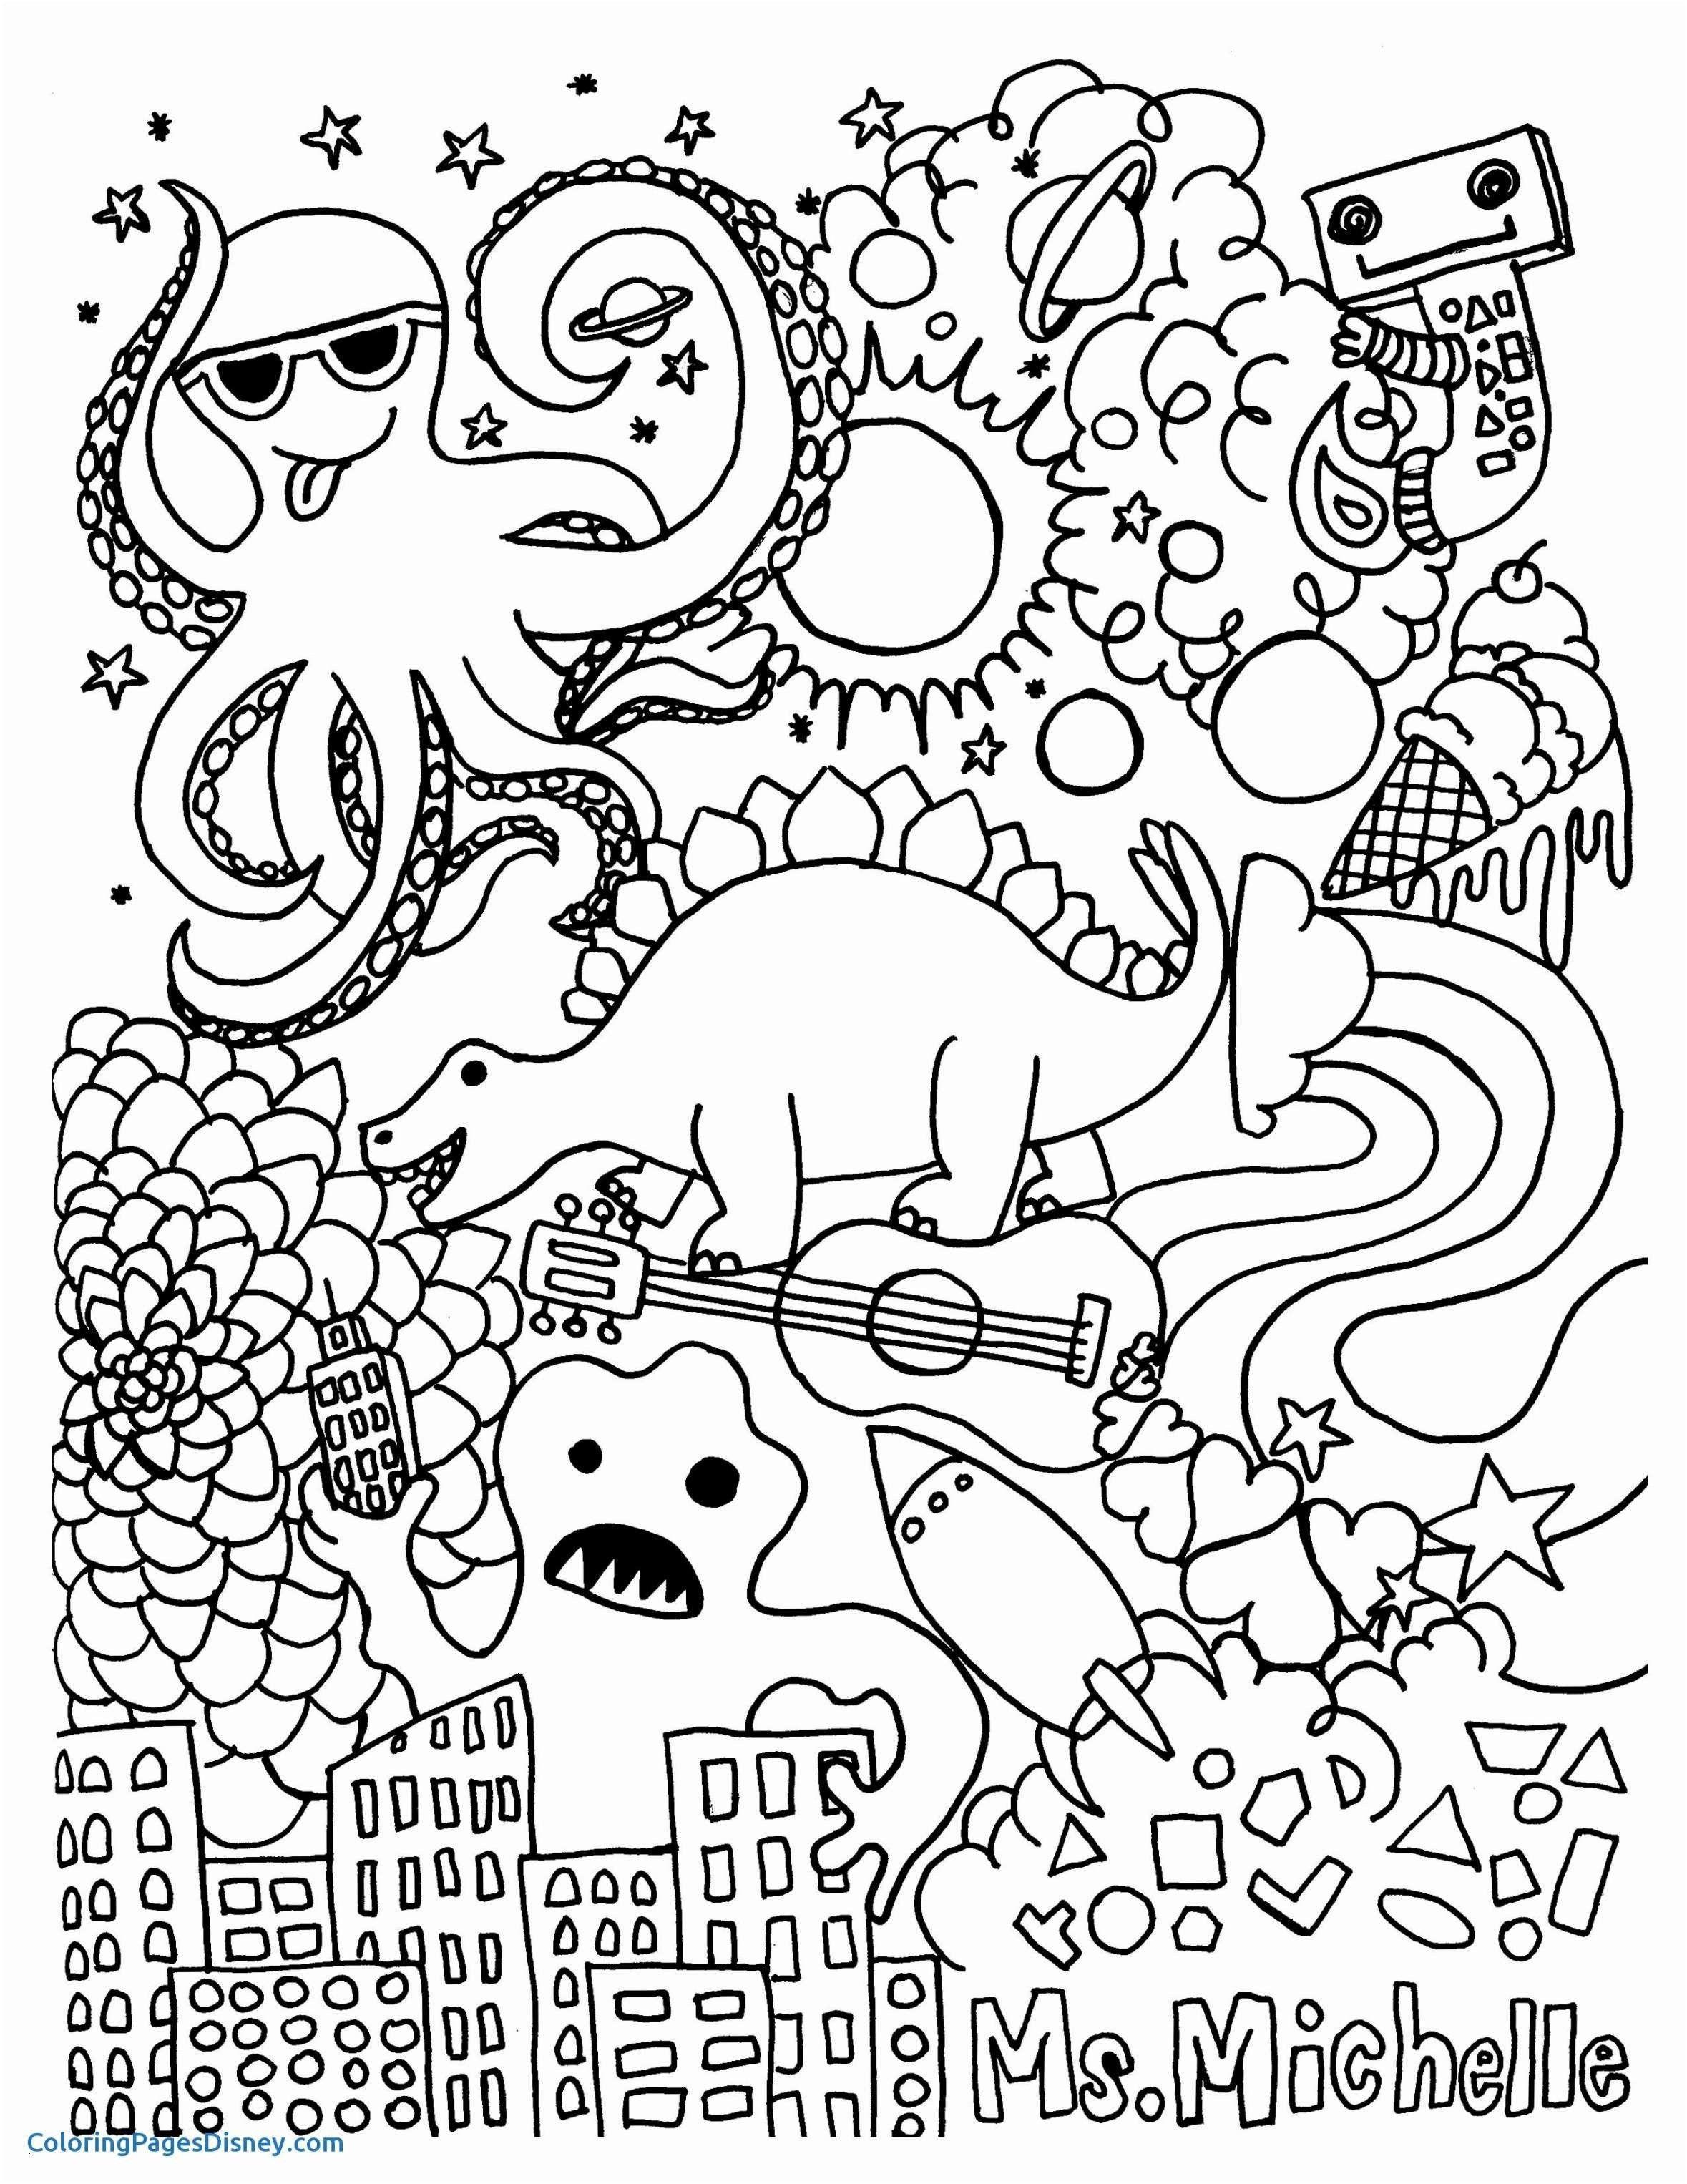 Neu Malvorlagen Monster Quad Coloring Pages Inspirational Alphabet Coloring Pages Mandala Coloring Pages